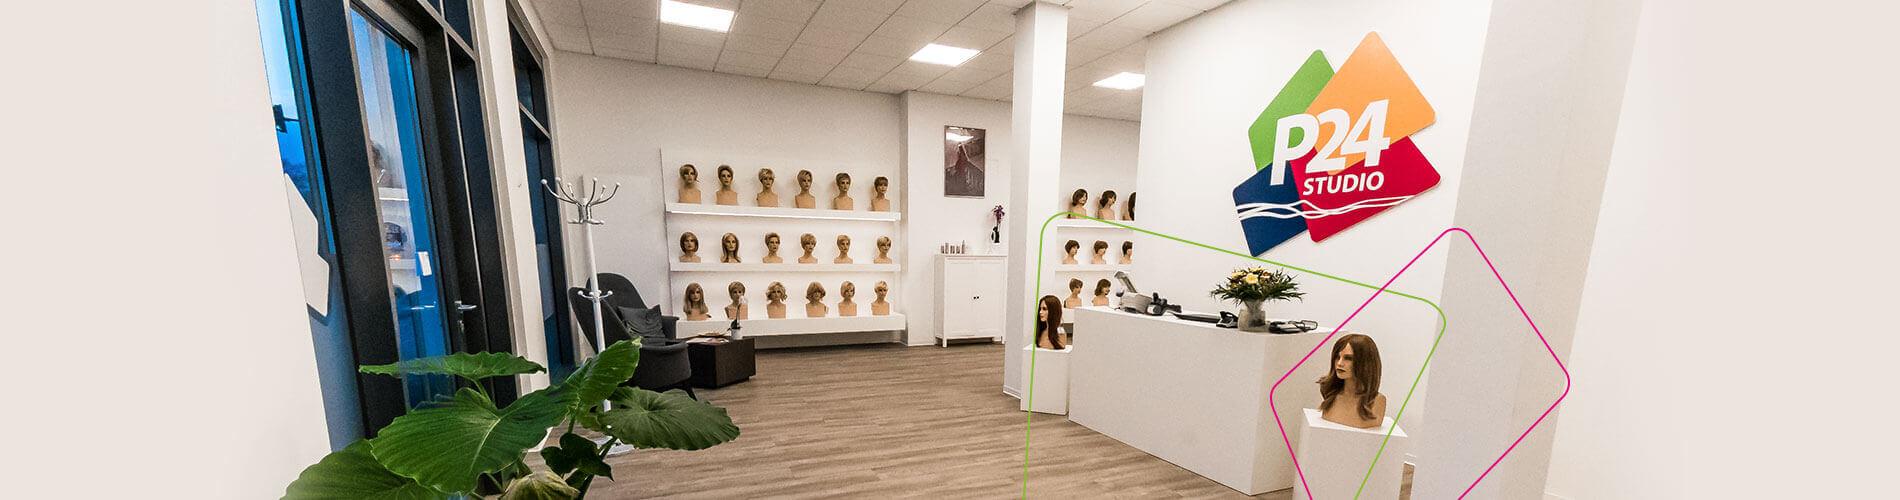 Perücken 24 Studio - Studio